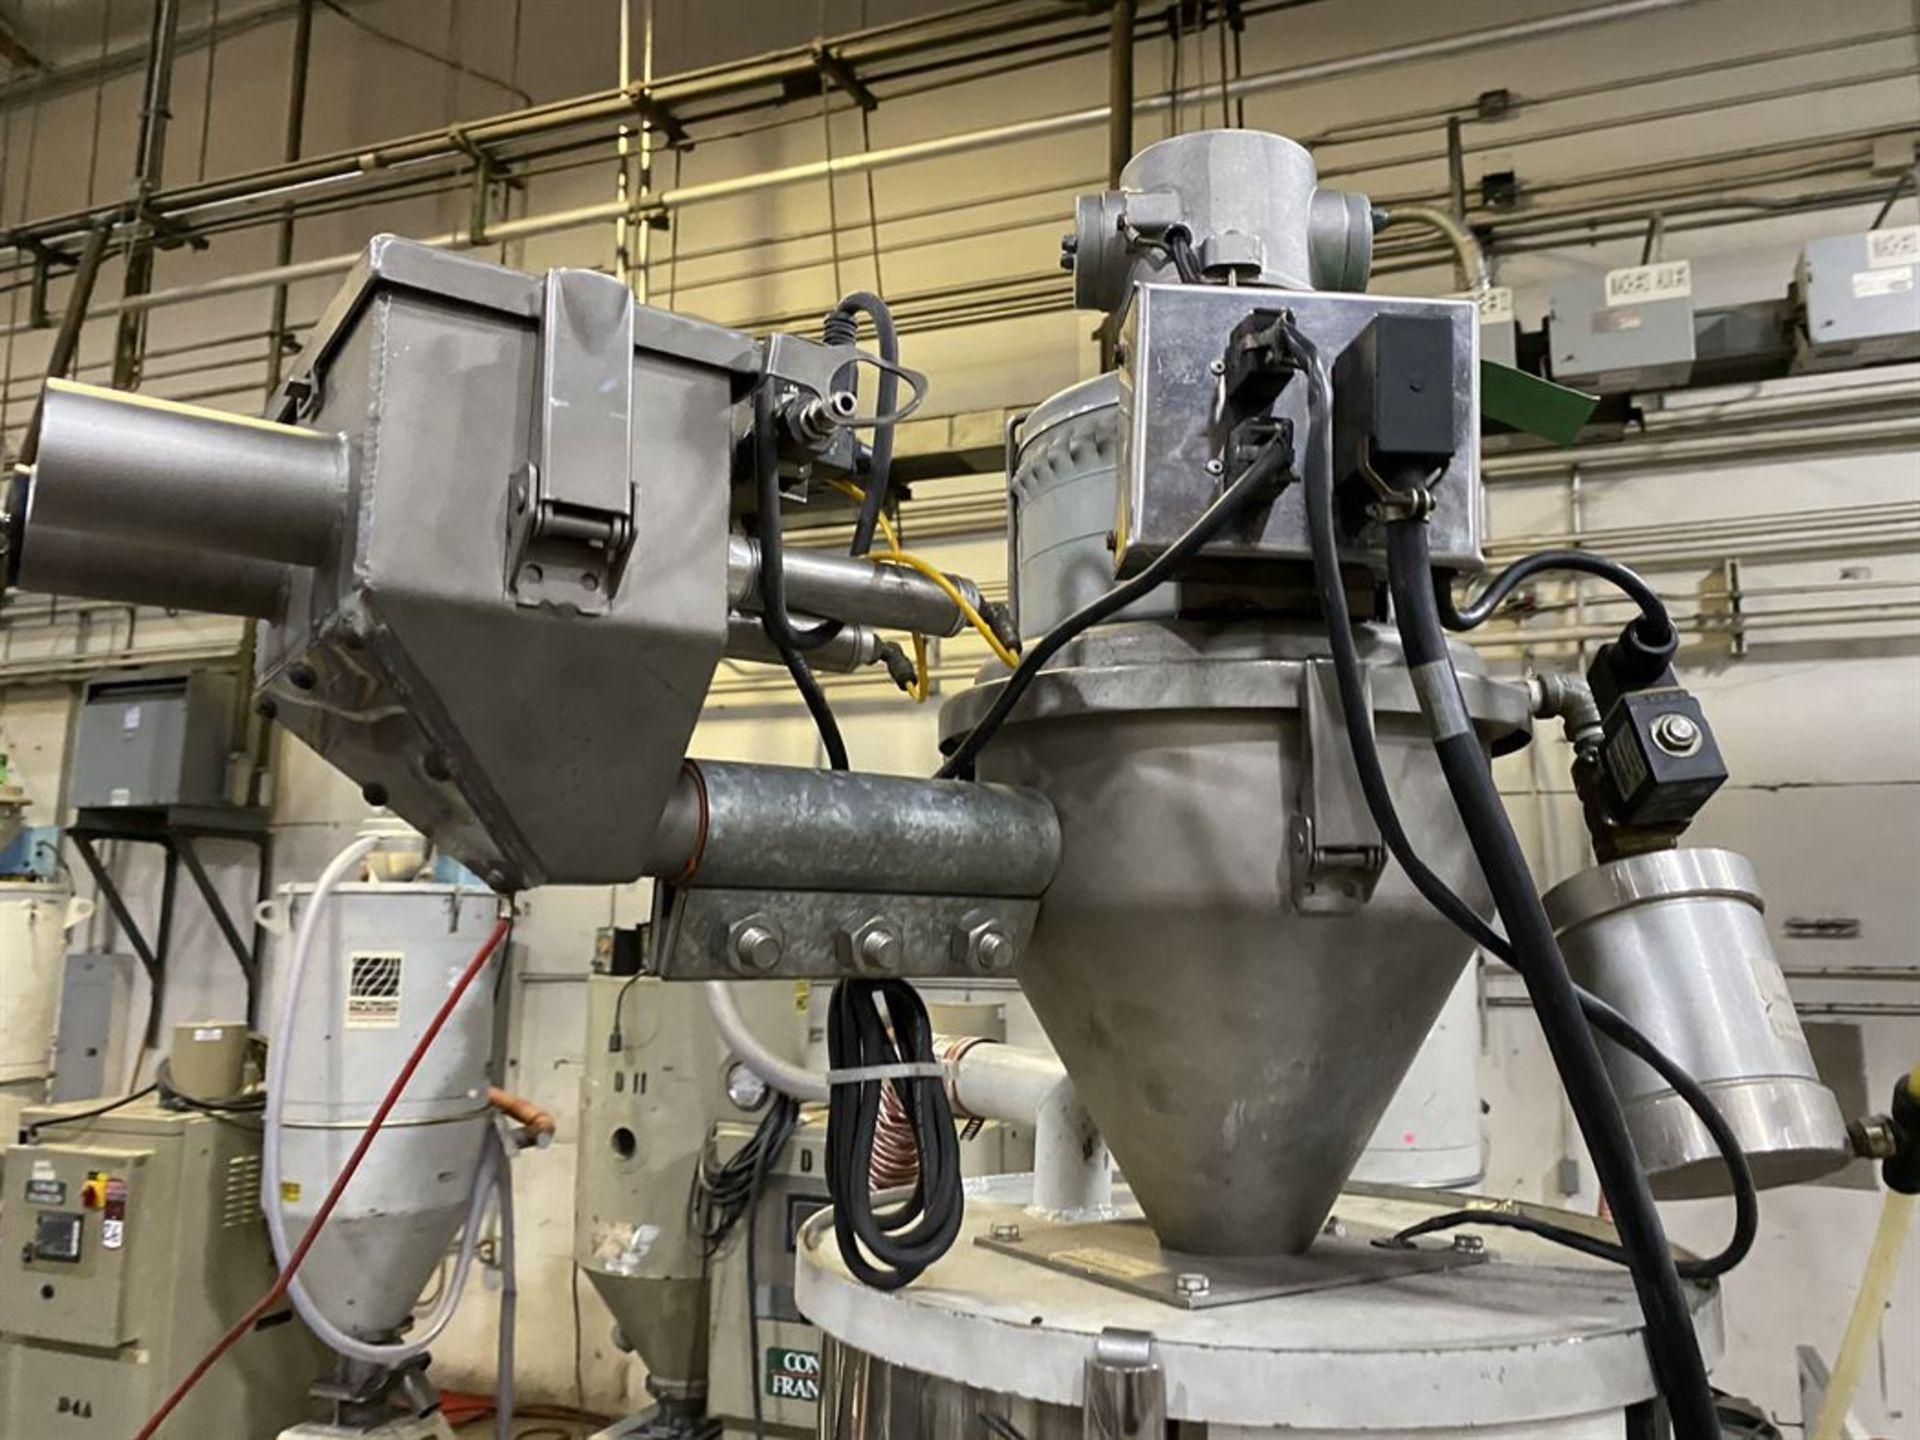 Lot 222 - Cincinnati Milacron M-GS-60 Hopper Dryer System, s/n 3933A01-05-49, w/ Vacuum Loader